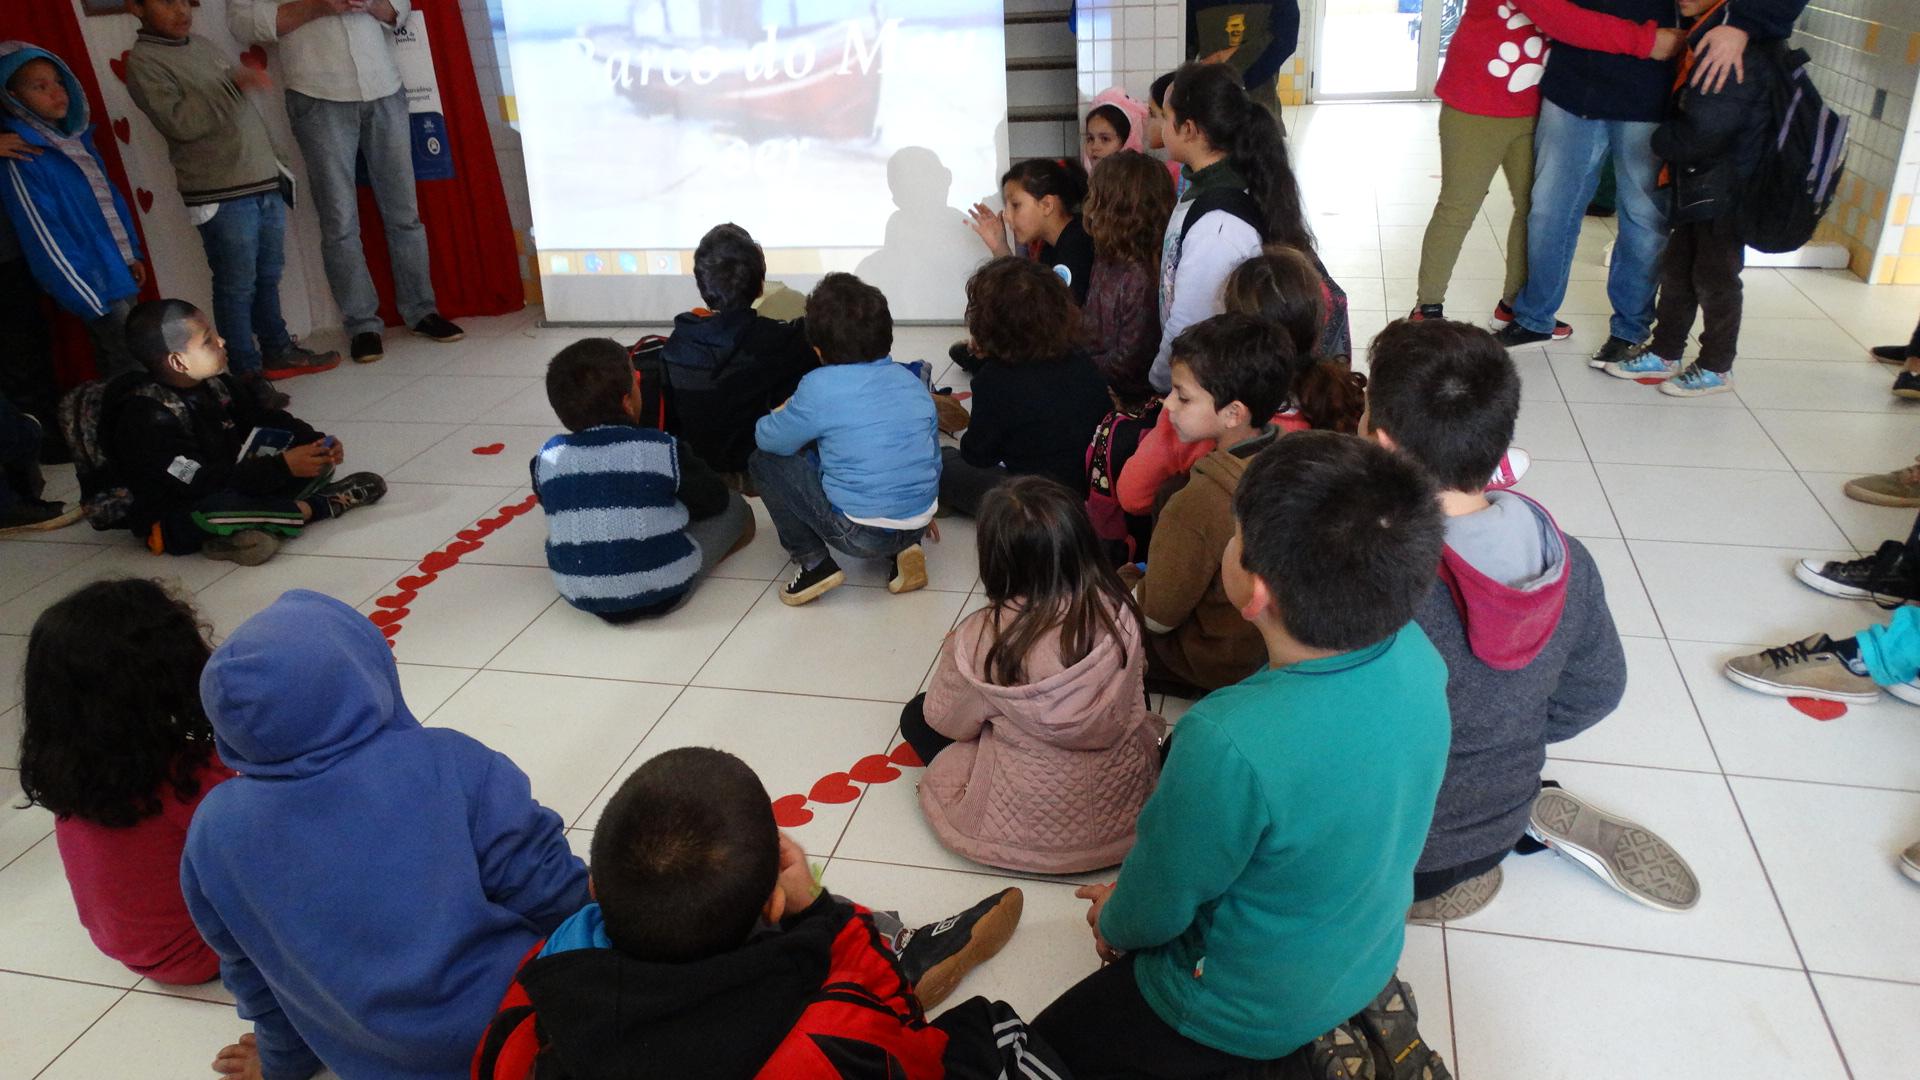 Juventude marista celebra Semana de São Marcelino Champagnat